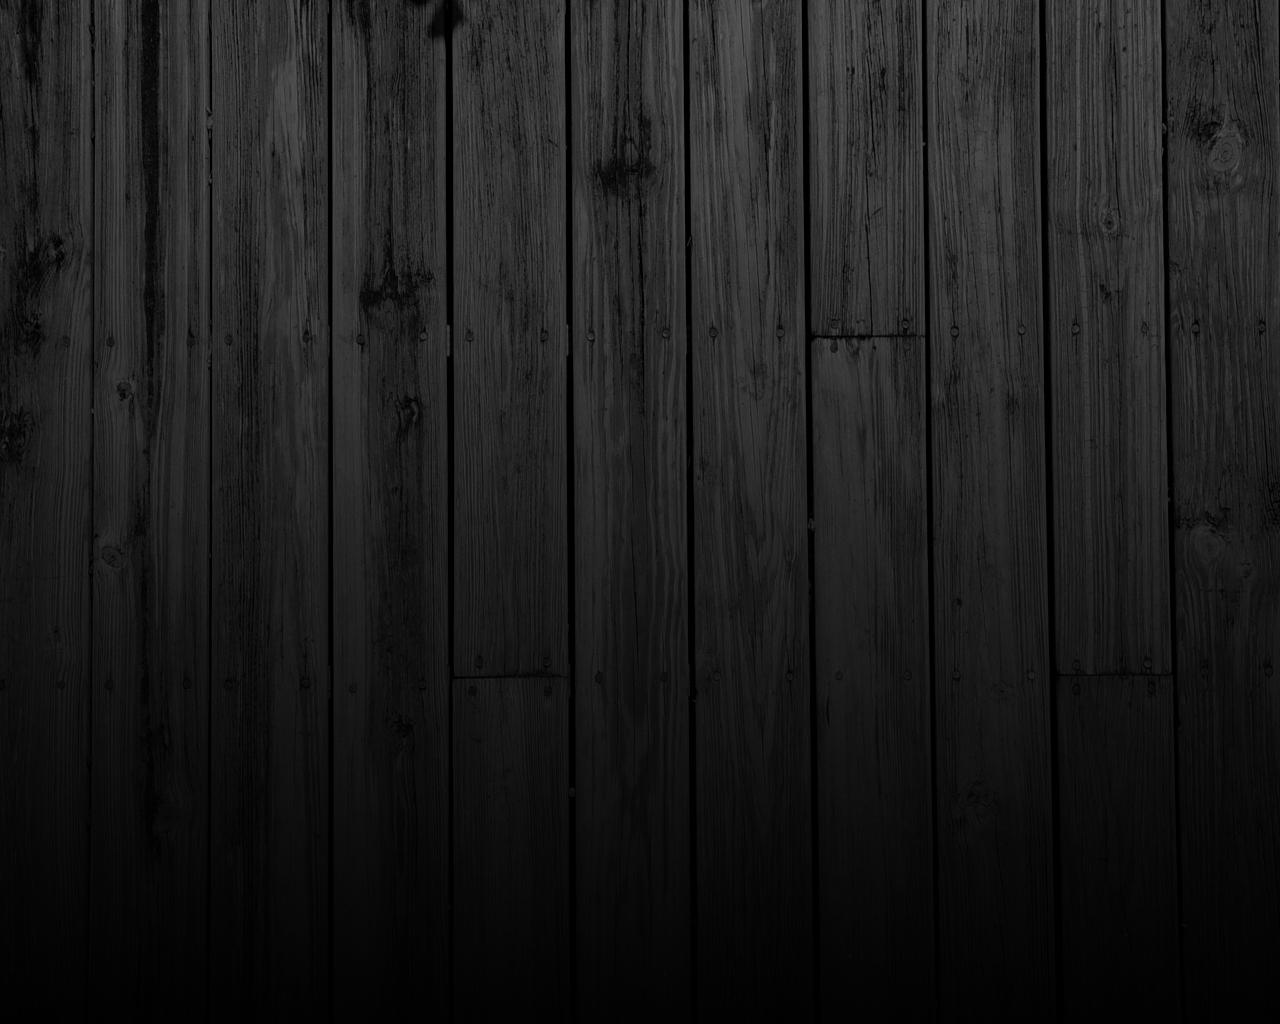 Dark Wooden Planks Desktop and mobile wallpaper Wallippo 1280x1024